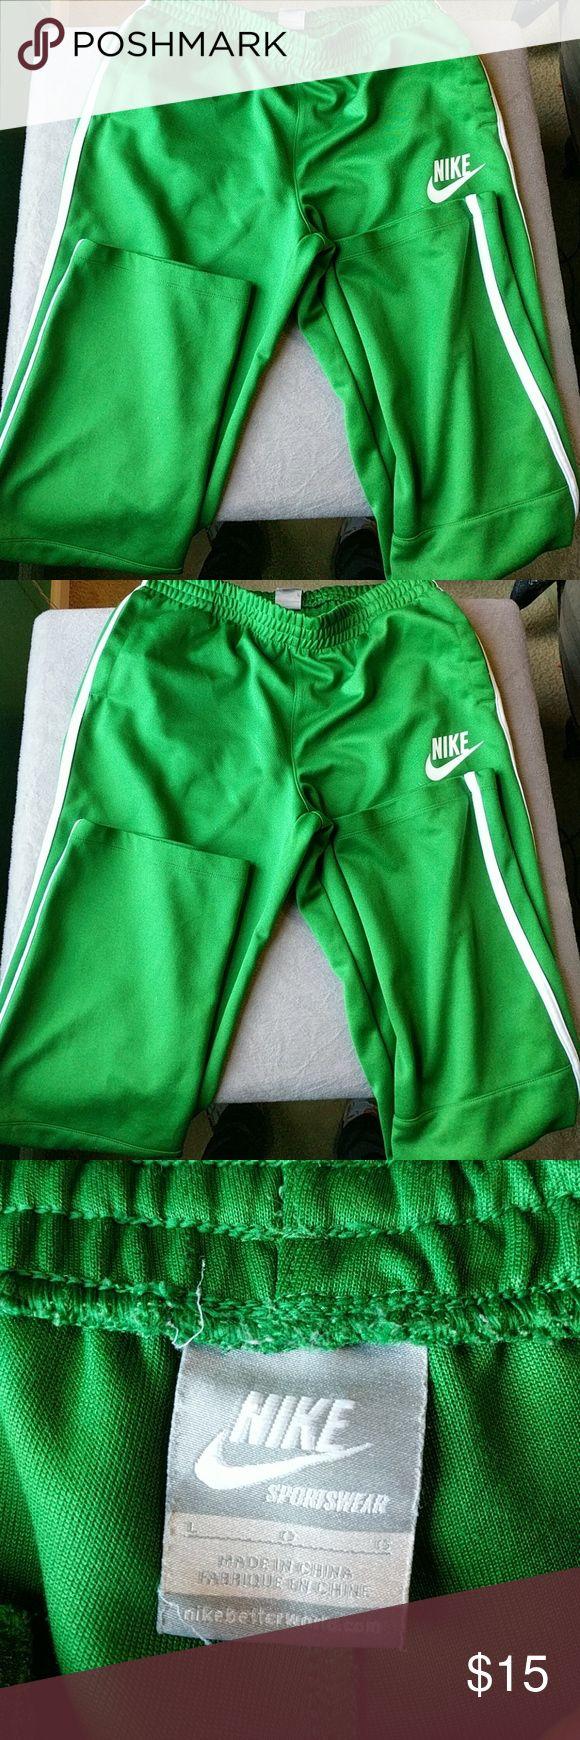 Nike sportswear fleece pants (discontinued) Very comfortable, Barely Used, Nike sweatpants Nike Pants Sweatpants & Joggers